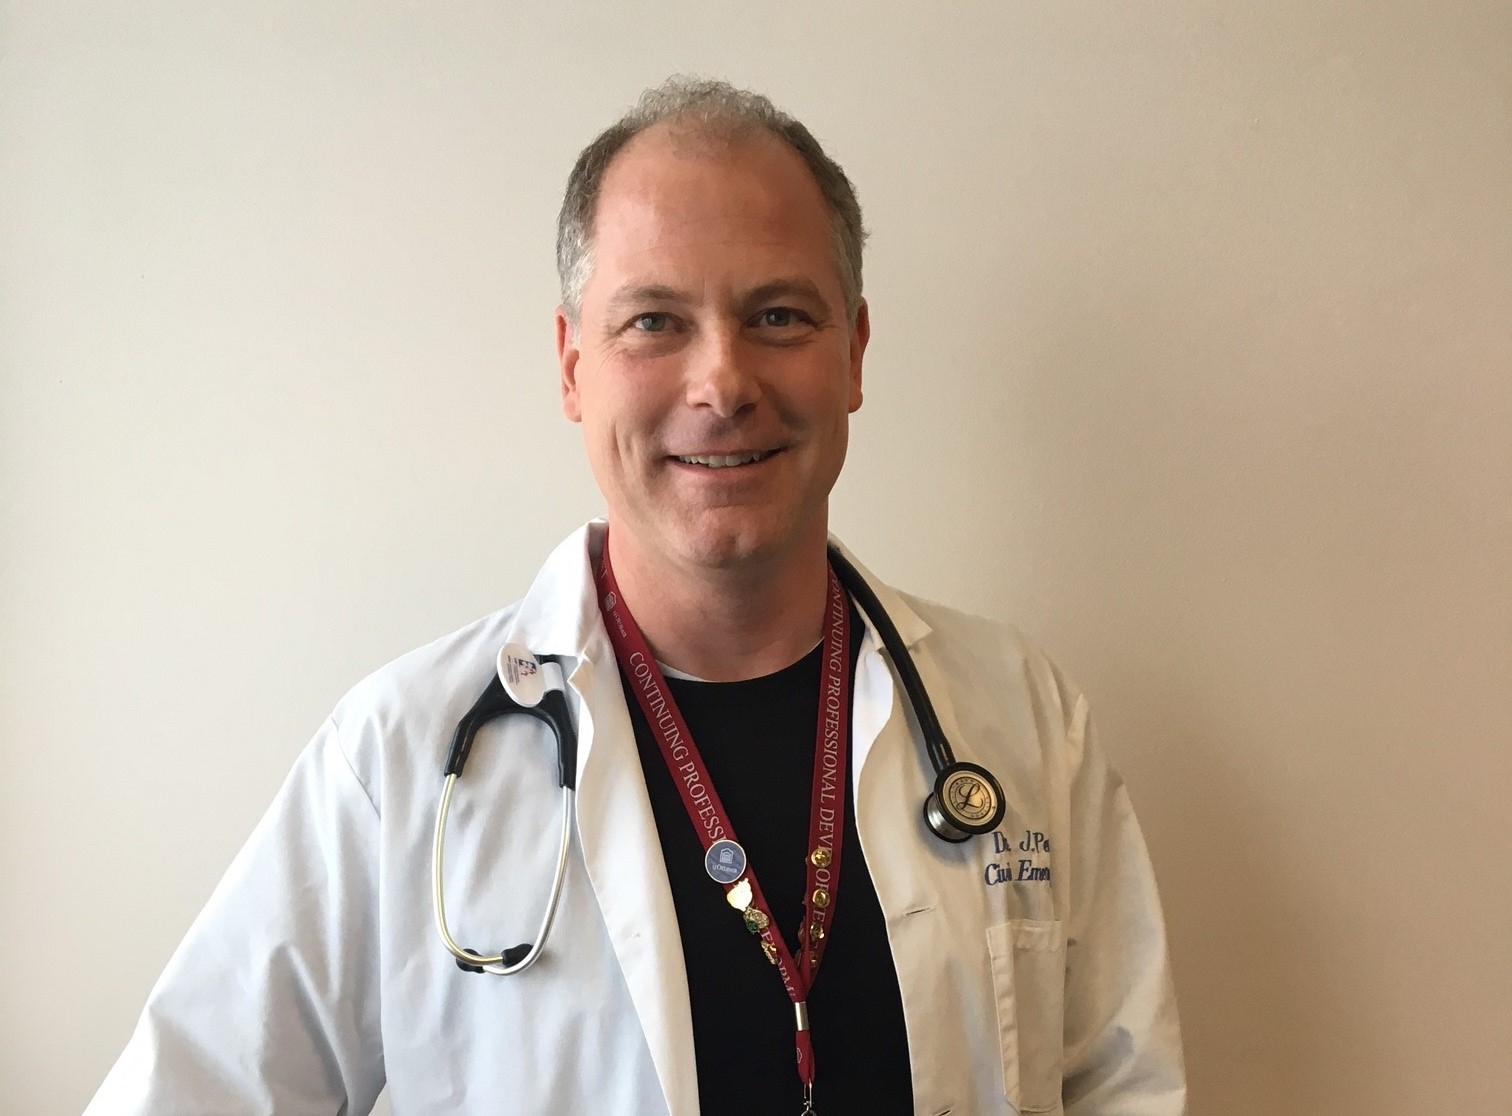 Dr. Jeffrey Perrey